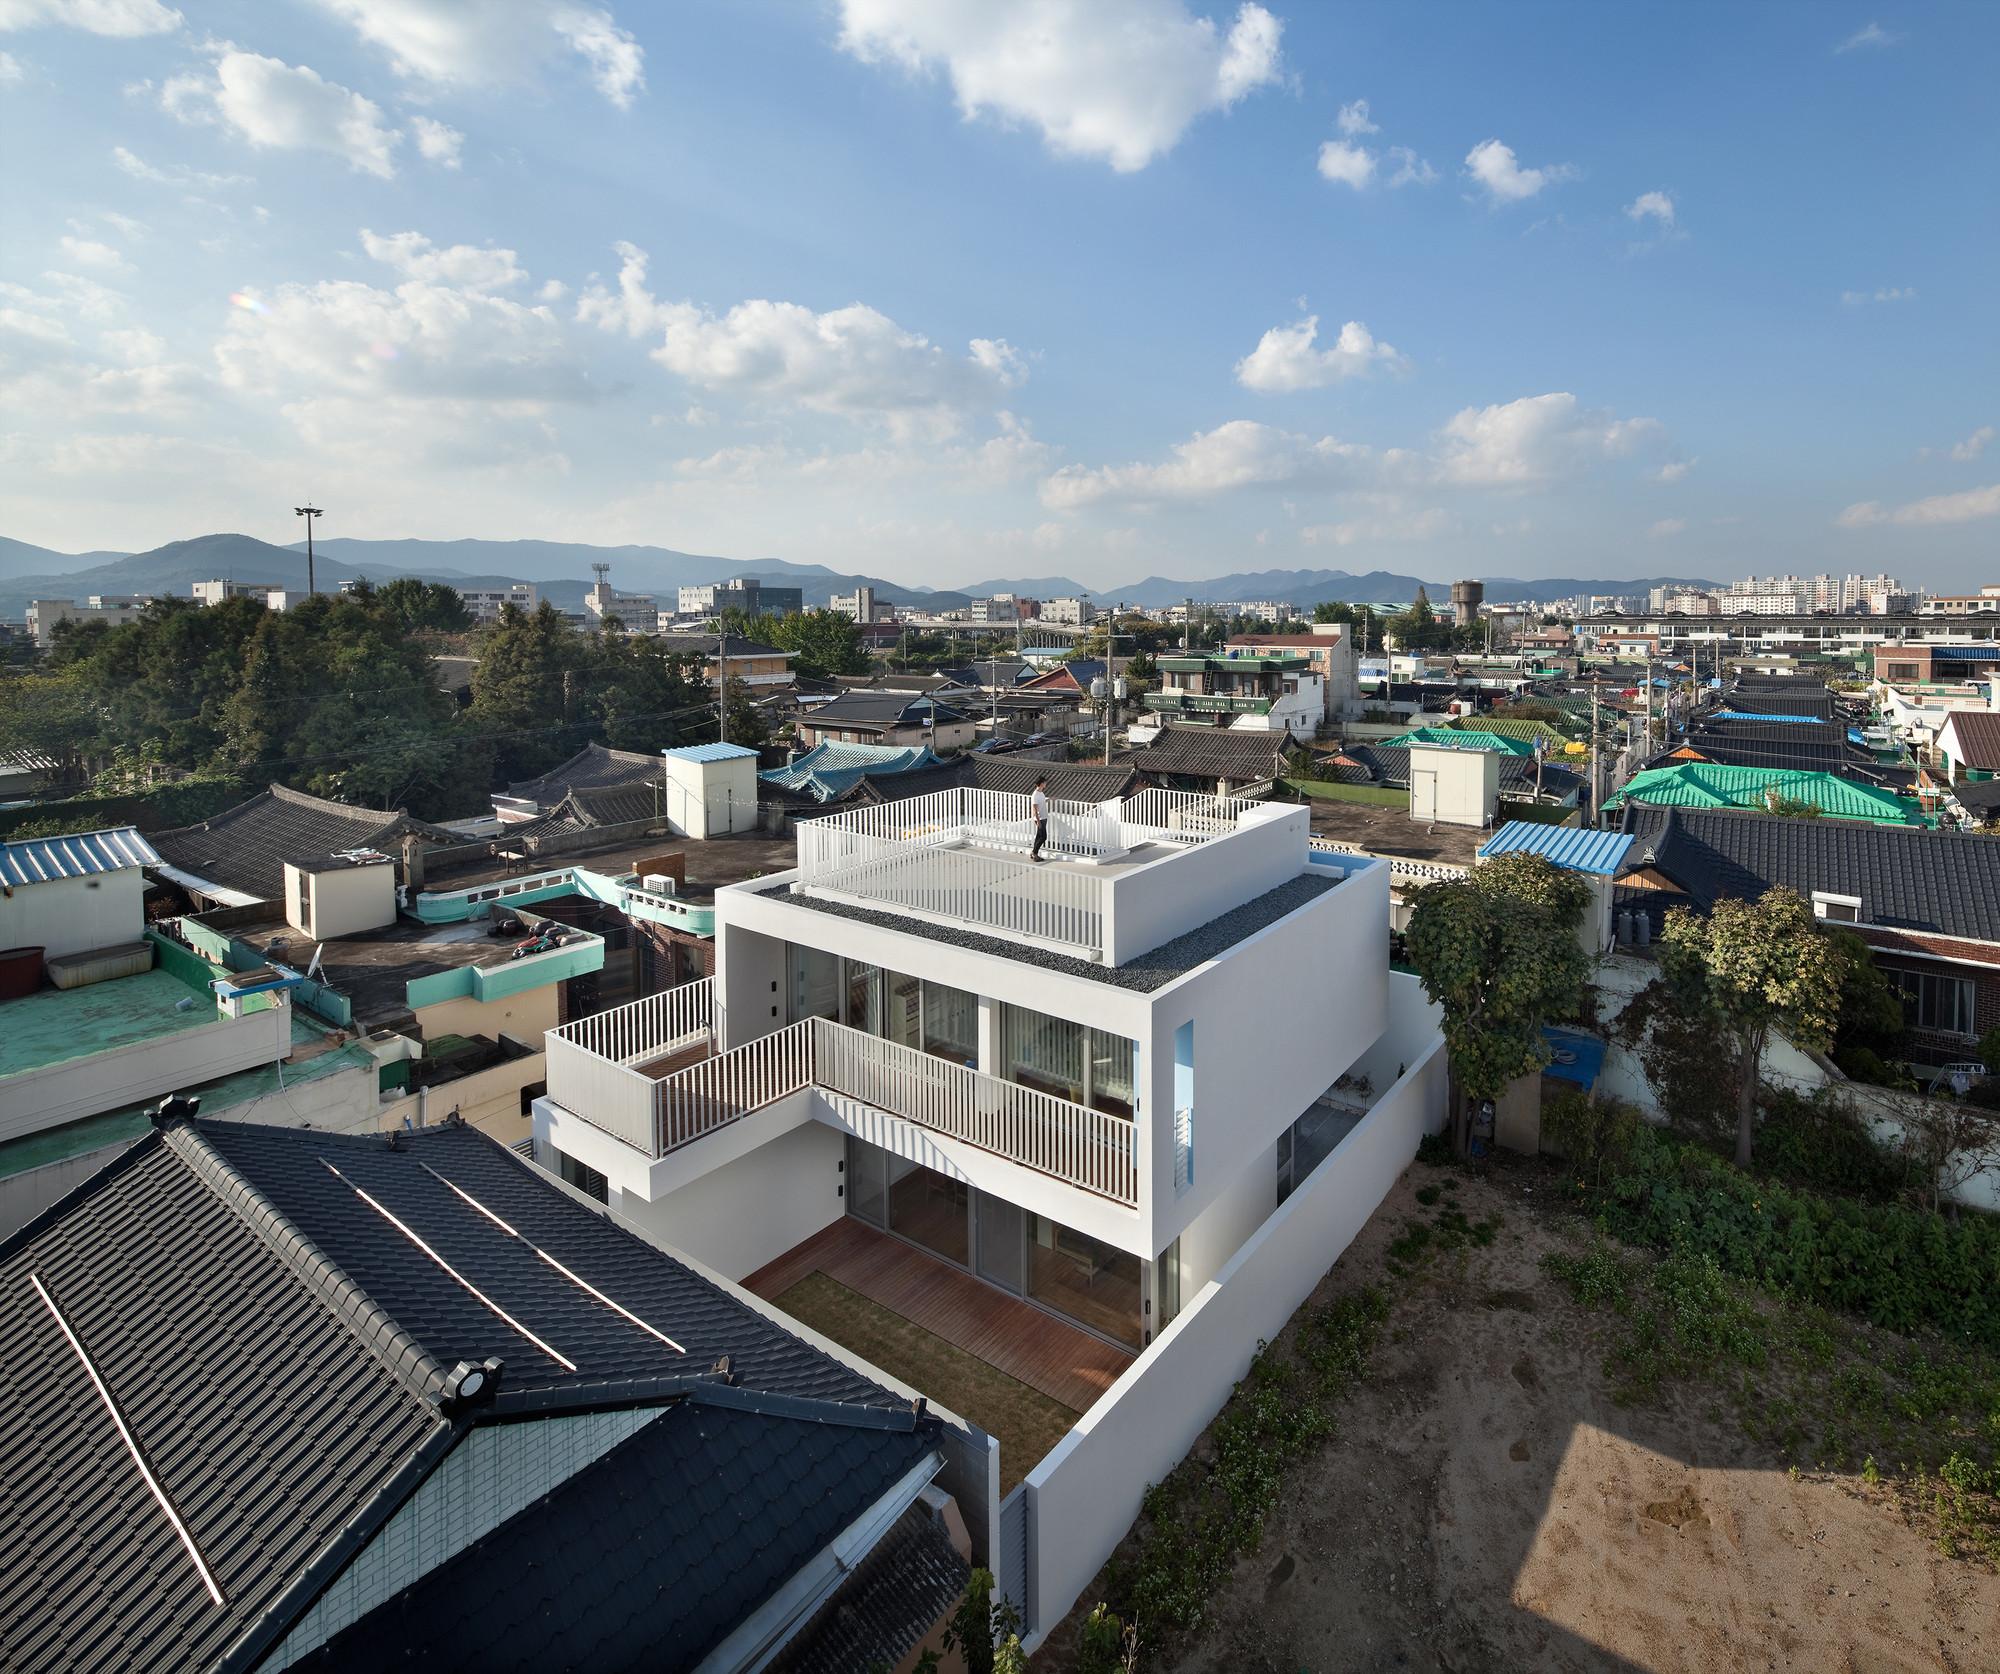 172M2 compact House / JMY architects